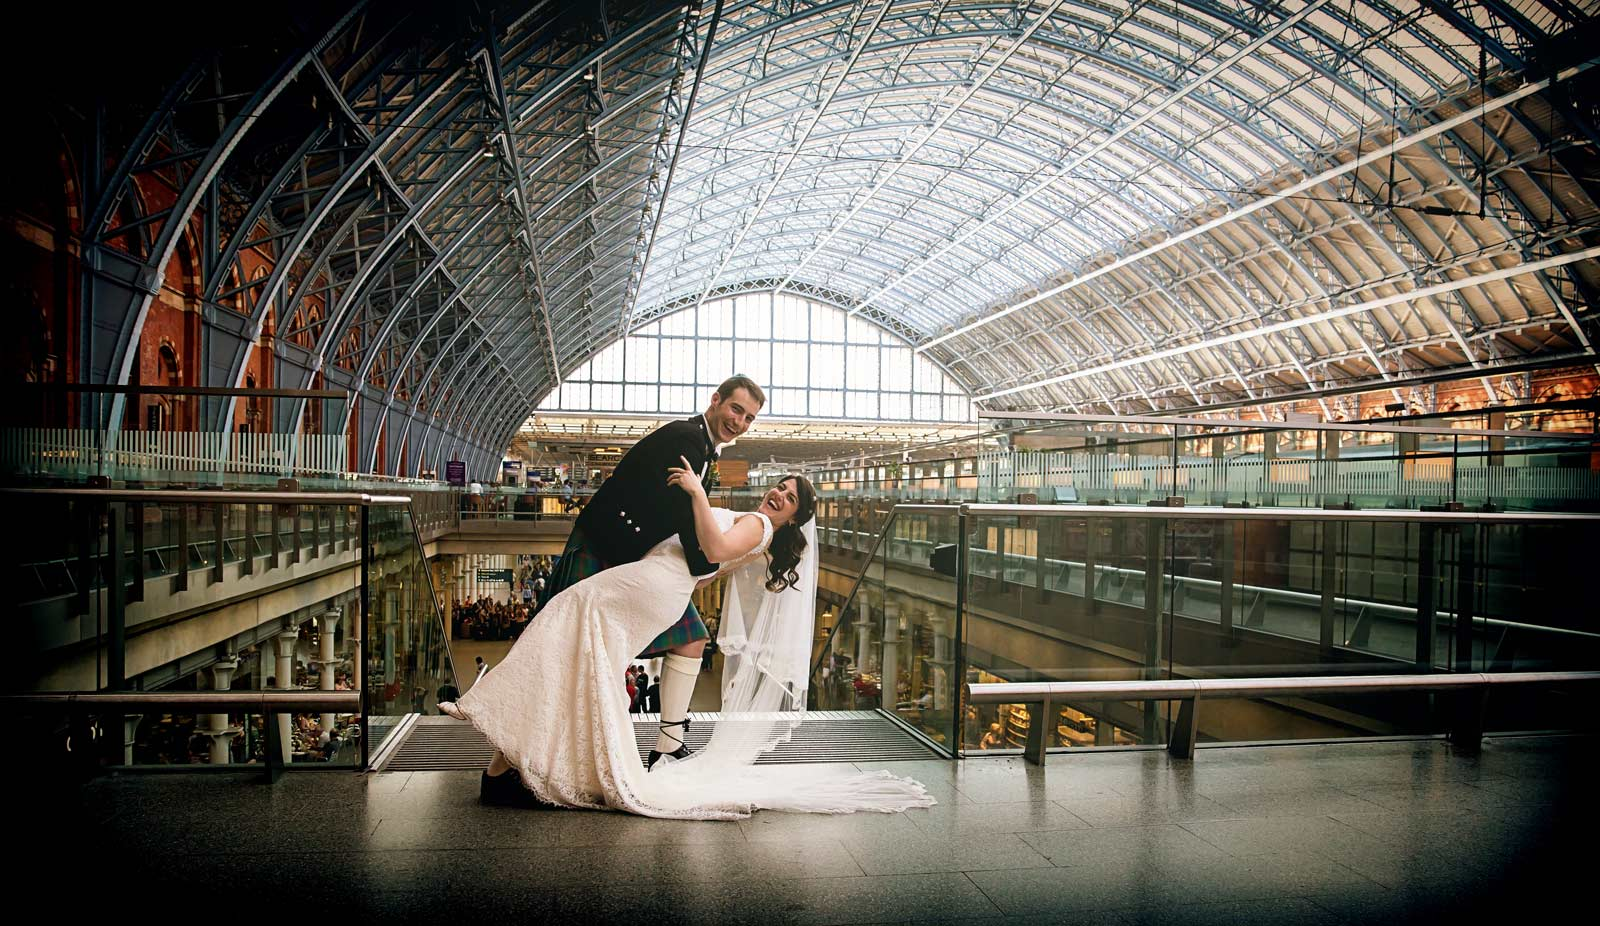 Wedding dance at St Pancras London